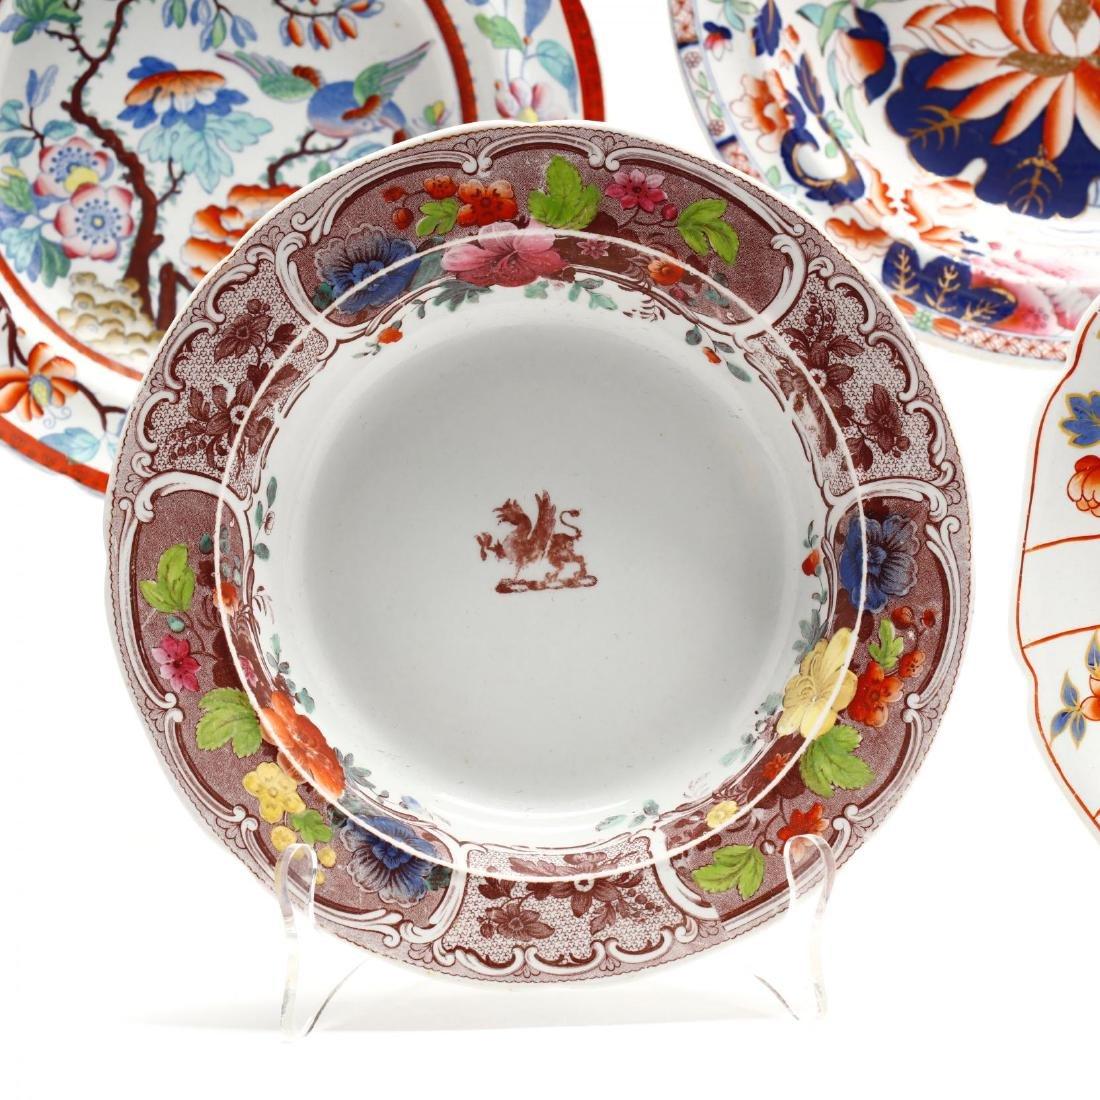 A Collection of Antique Soup Bowls - 5